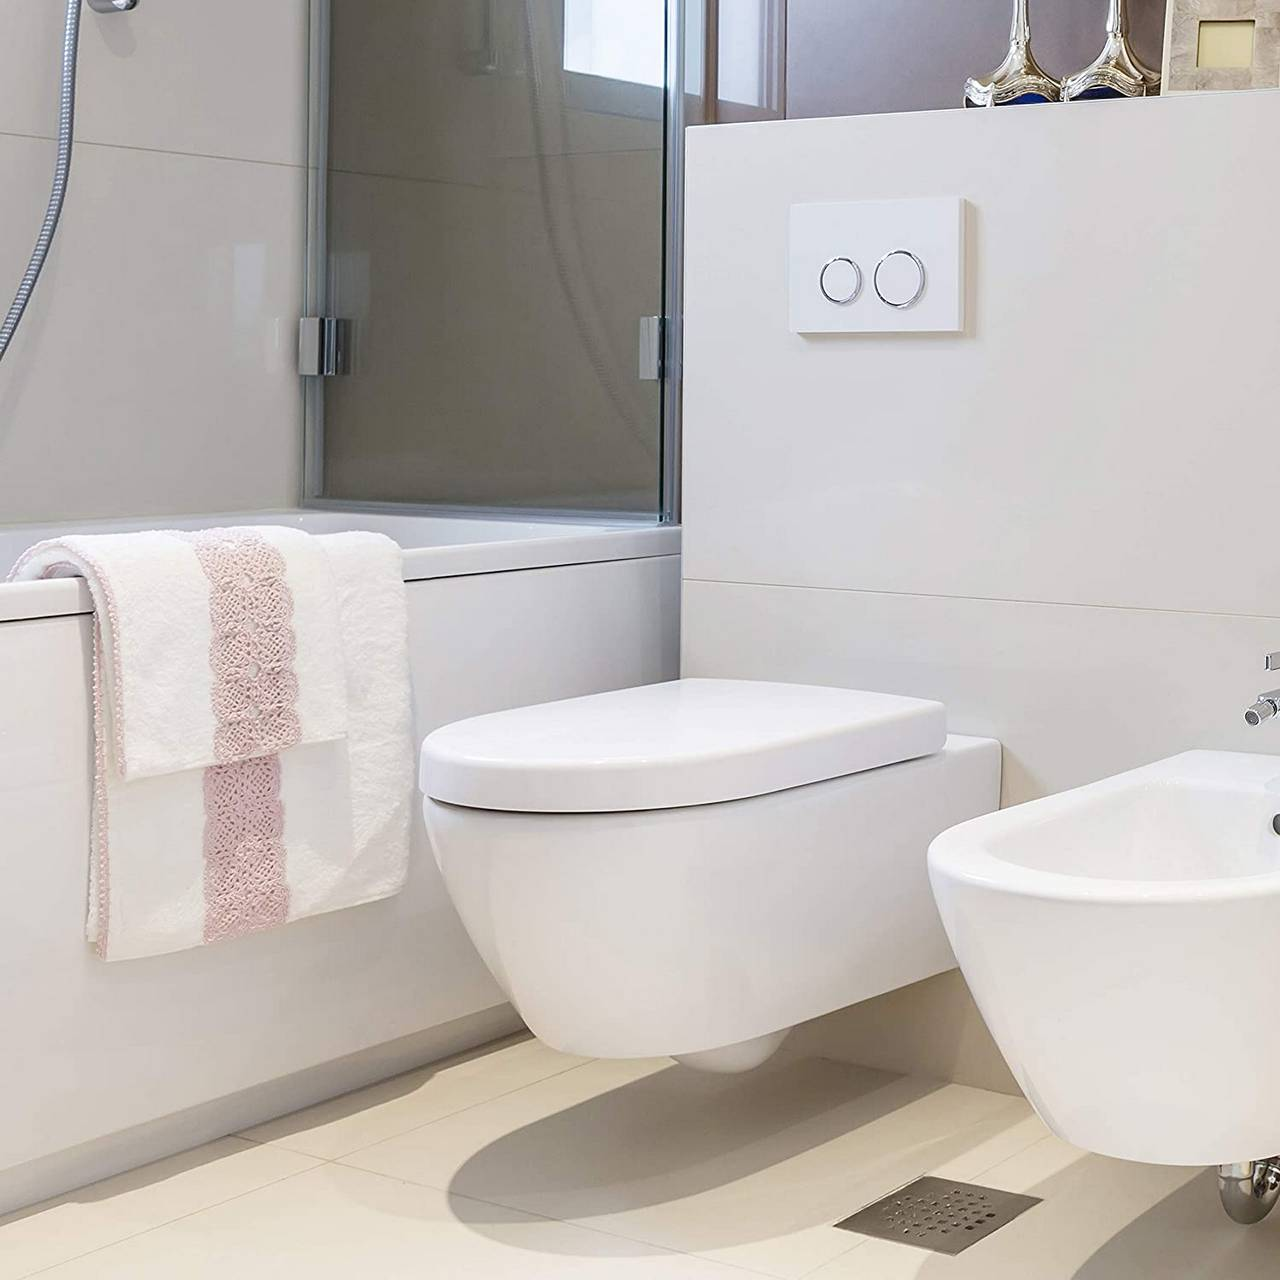 D Shape Toilet Seat Soft Close For Family Bathroom White Woltu Eu